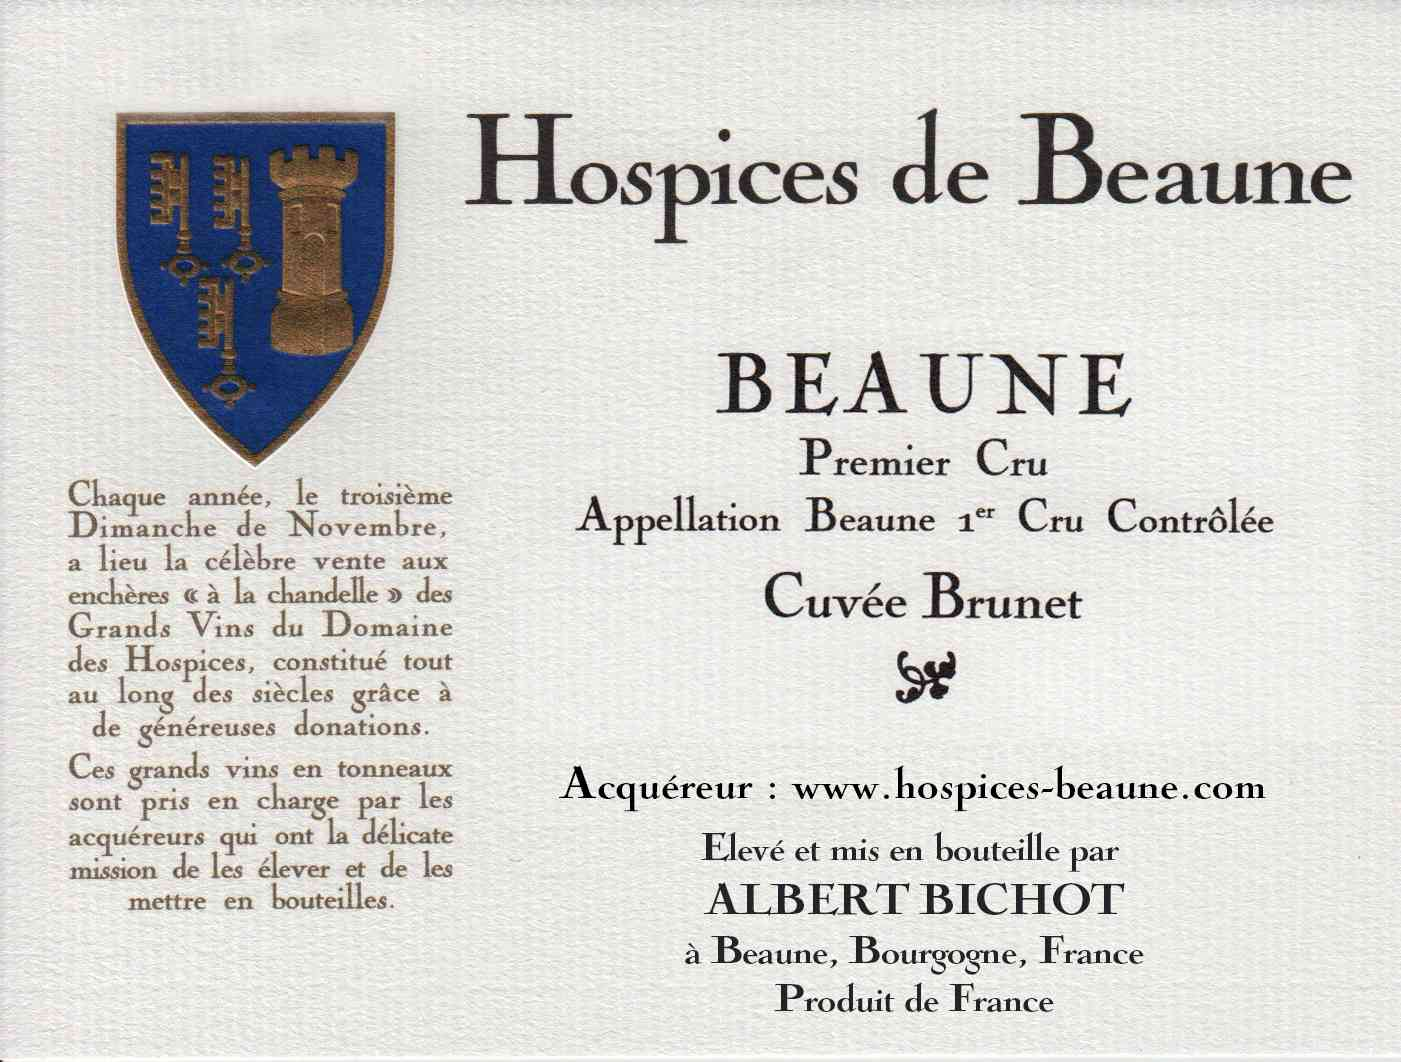 Encheres-auction-HospicesdeBeaune-AlbertBichot-Beaune1erCru-Cuvee-Brunet